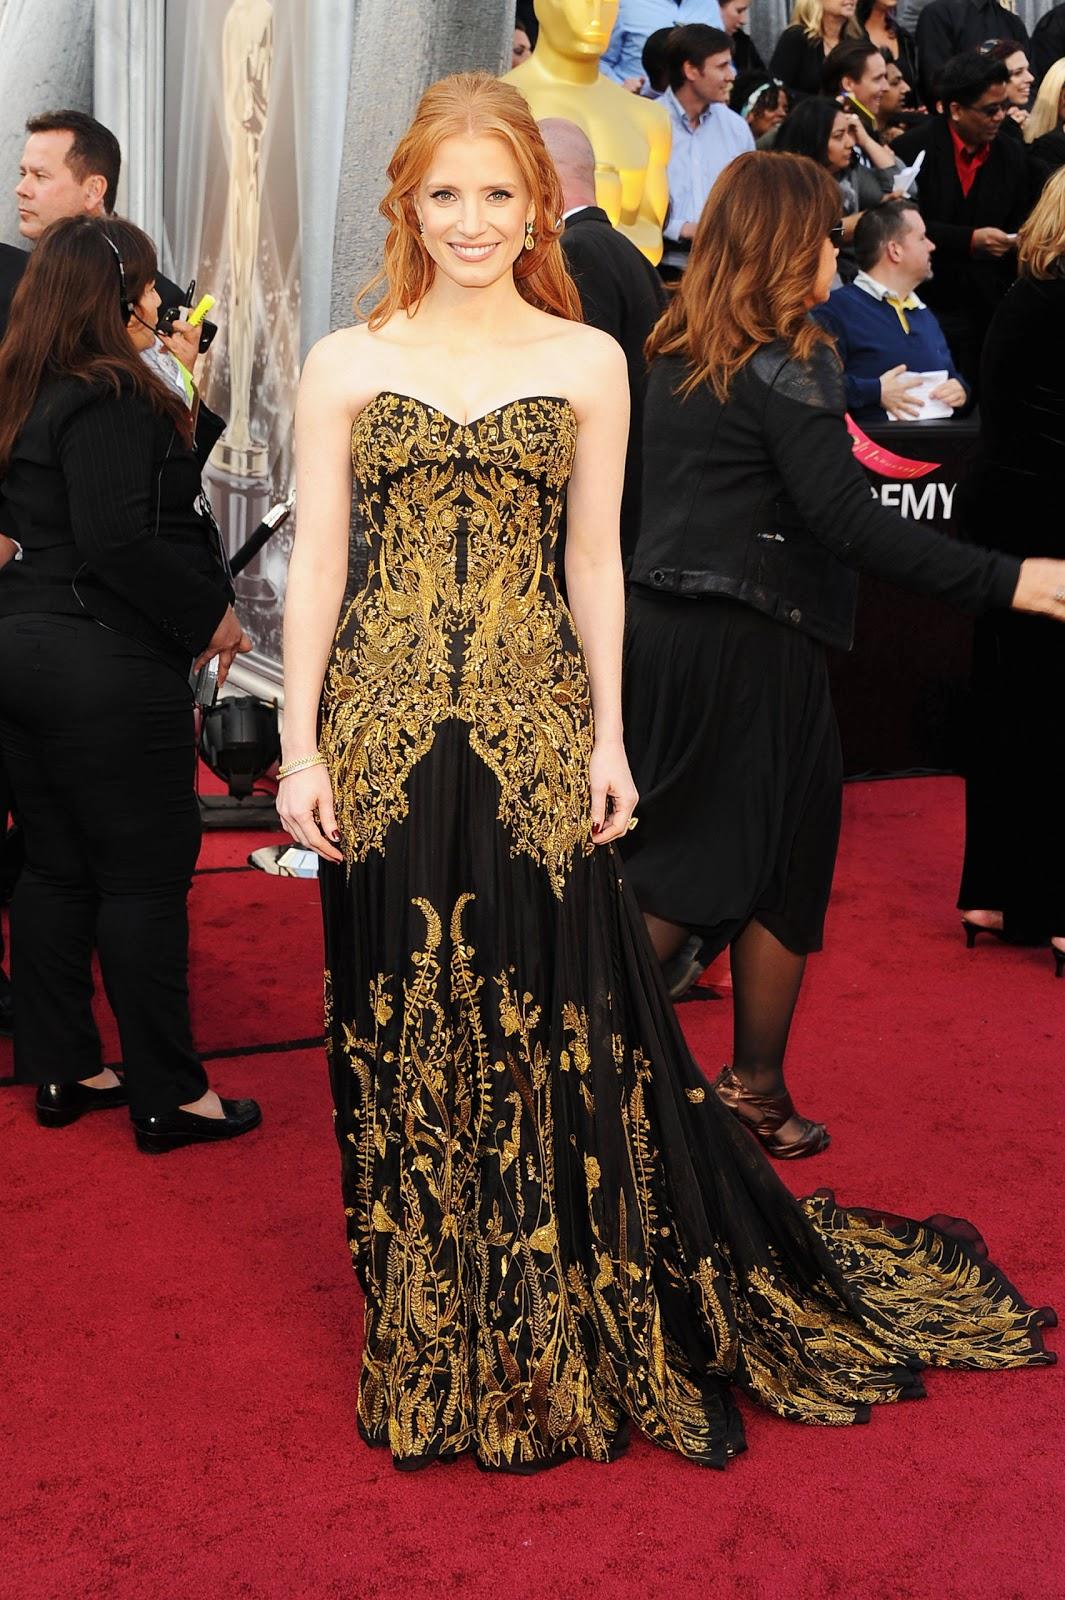 http://1.bp.blogspot.com/-gIdPHcInbvU/T4b_Y_YsaHI/AAAAAAAACcU/2lewixd0gLs/s1600/jessica_chastain_2012_Academy_Awards_Oscars_gold_black_Alexander_McQueen.jpg